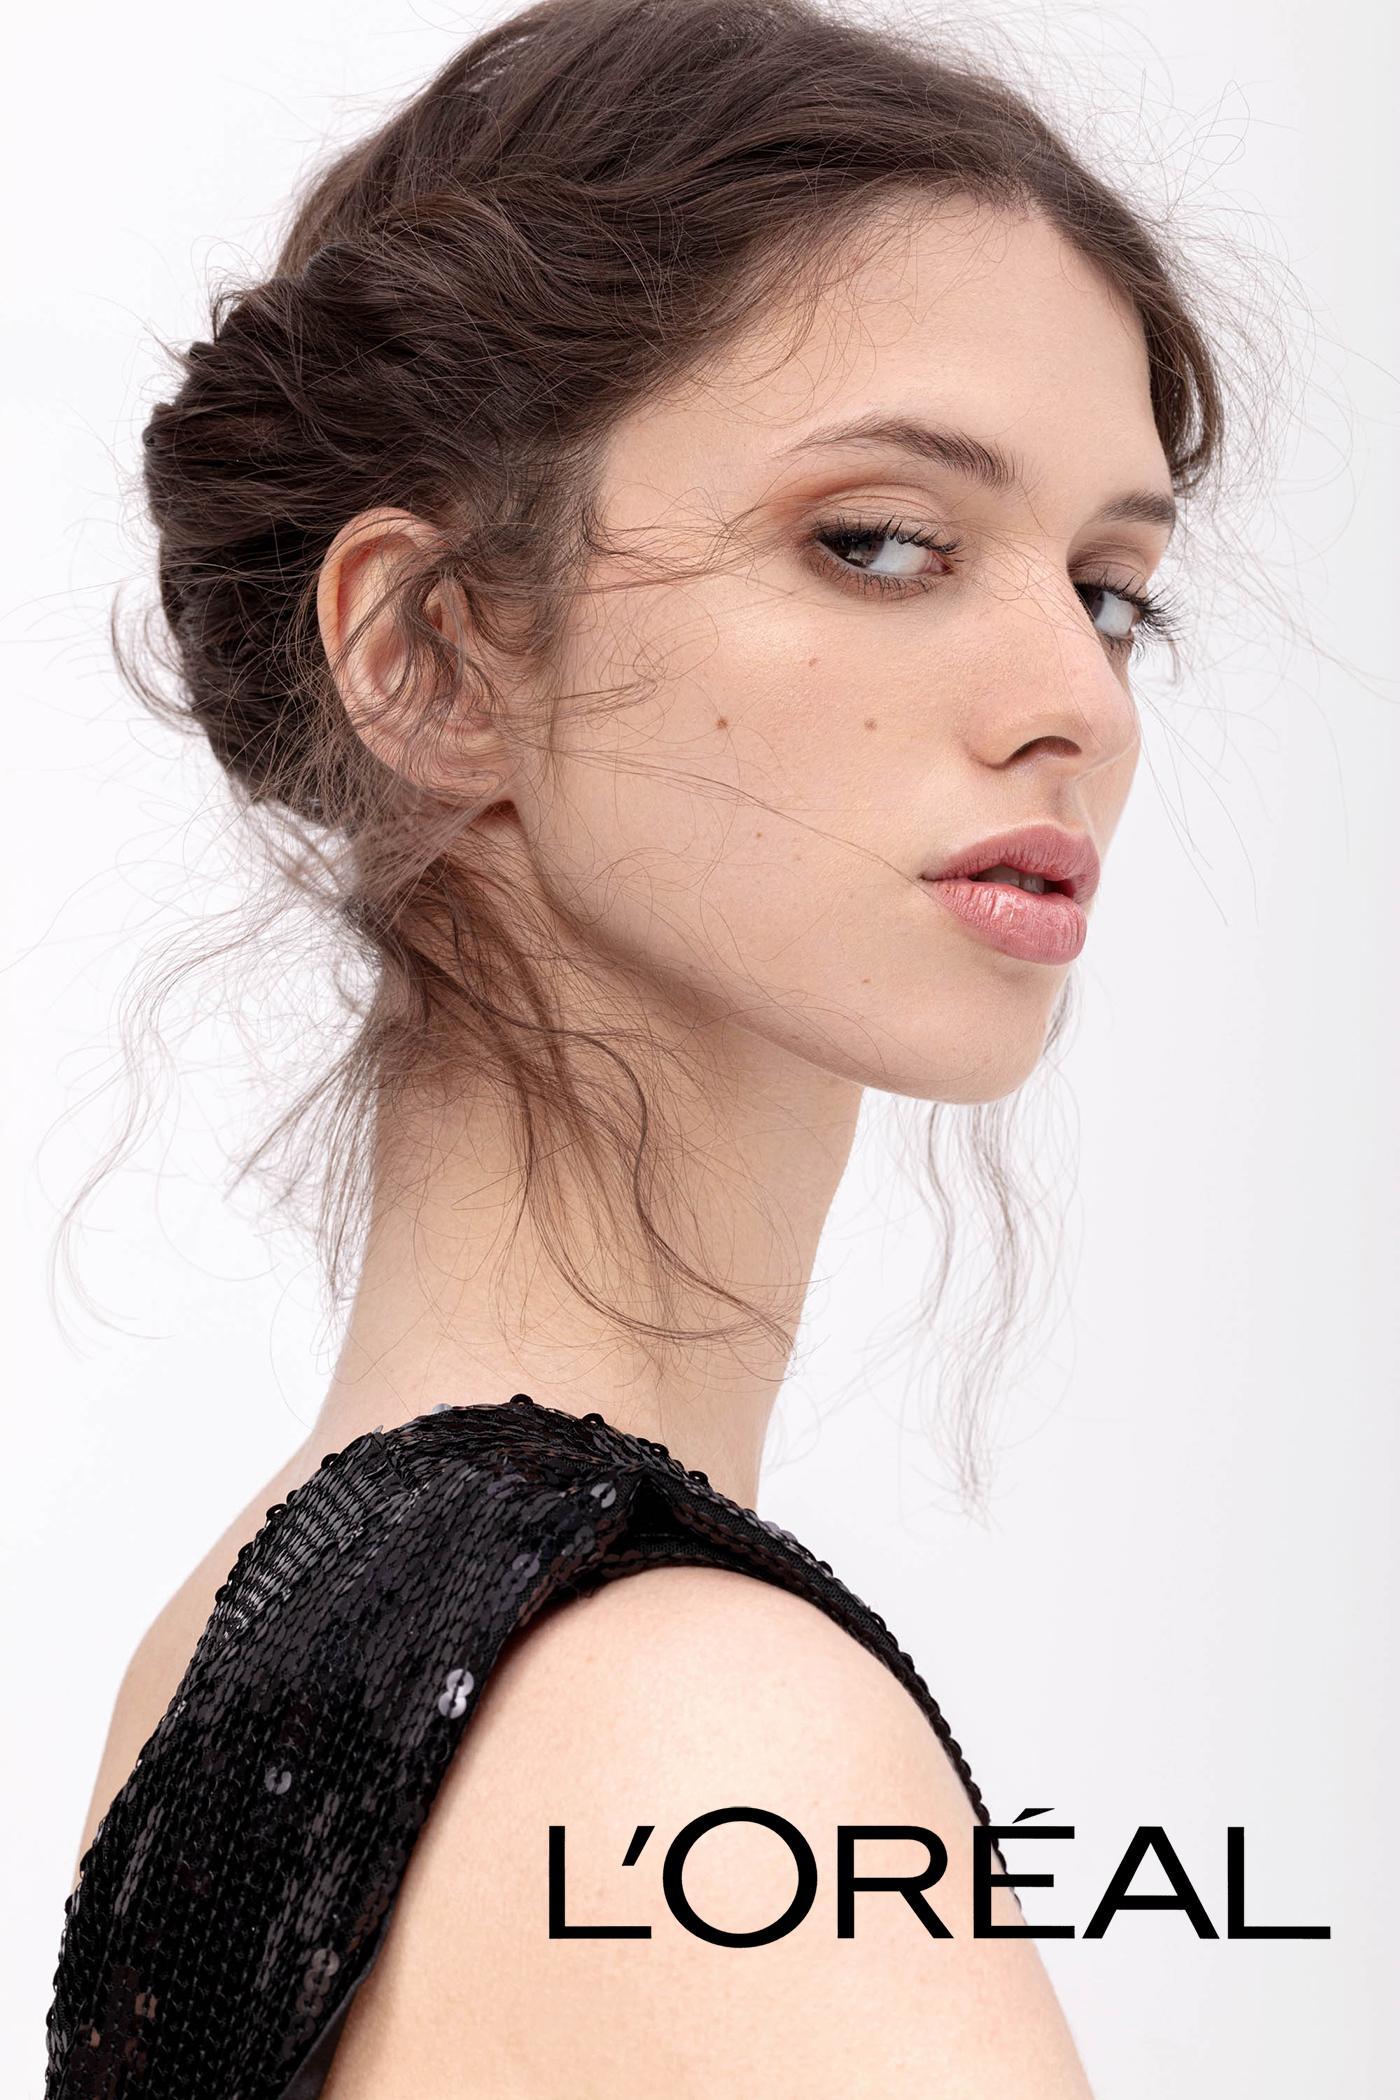 naturel make-up beauty